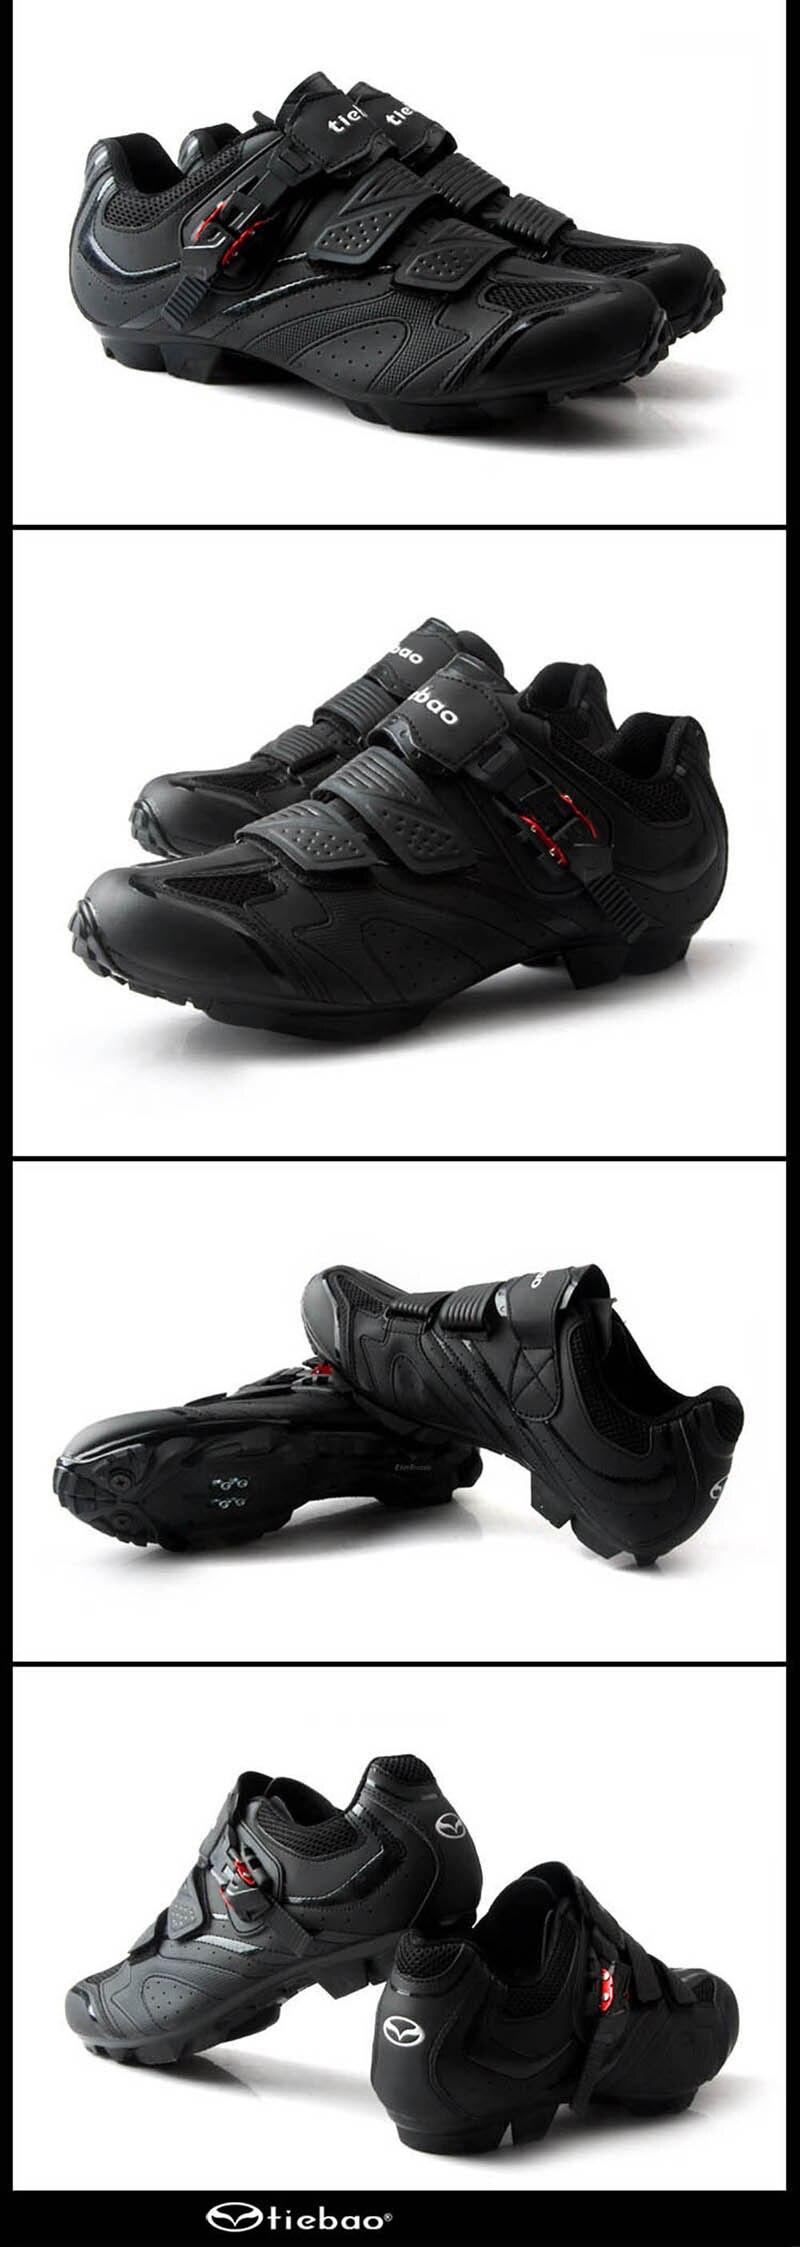 grampos pedais ciclismo sapatos de bicicleta de